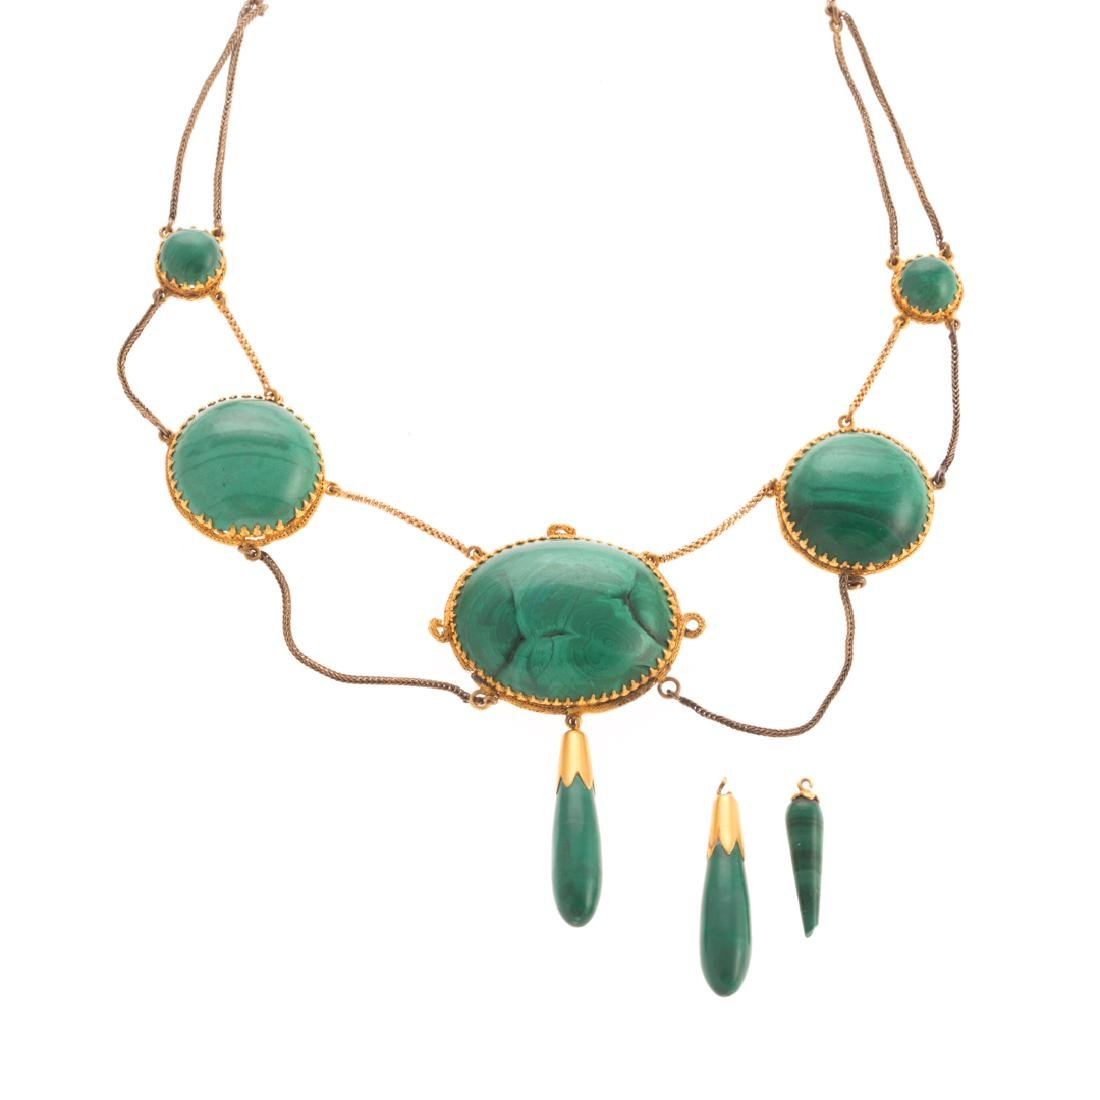 A Lady's Victorian Malachite Necklace